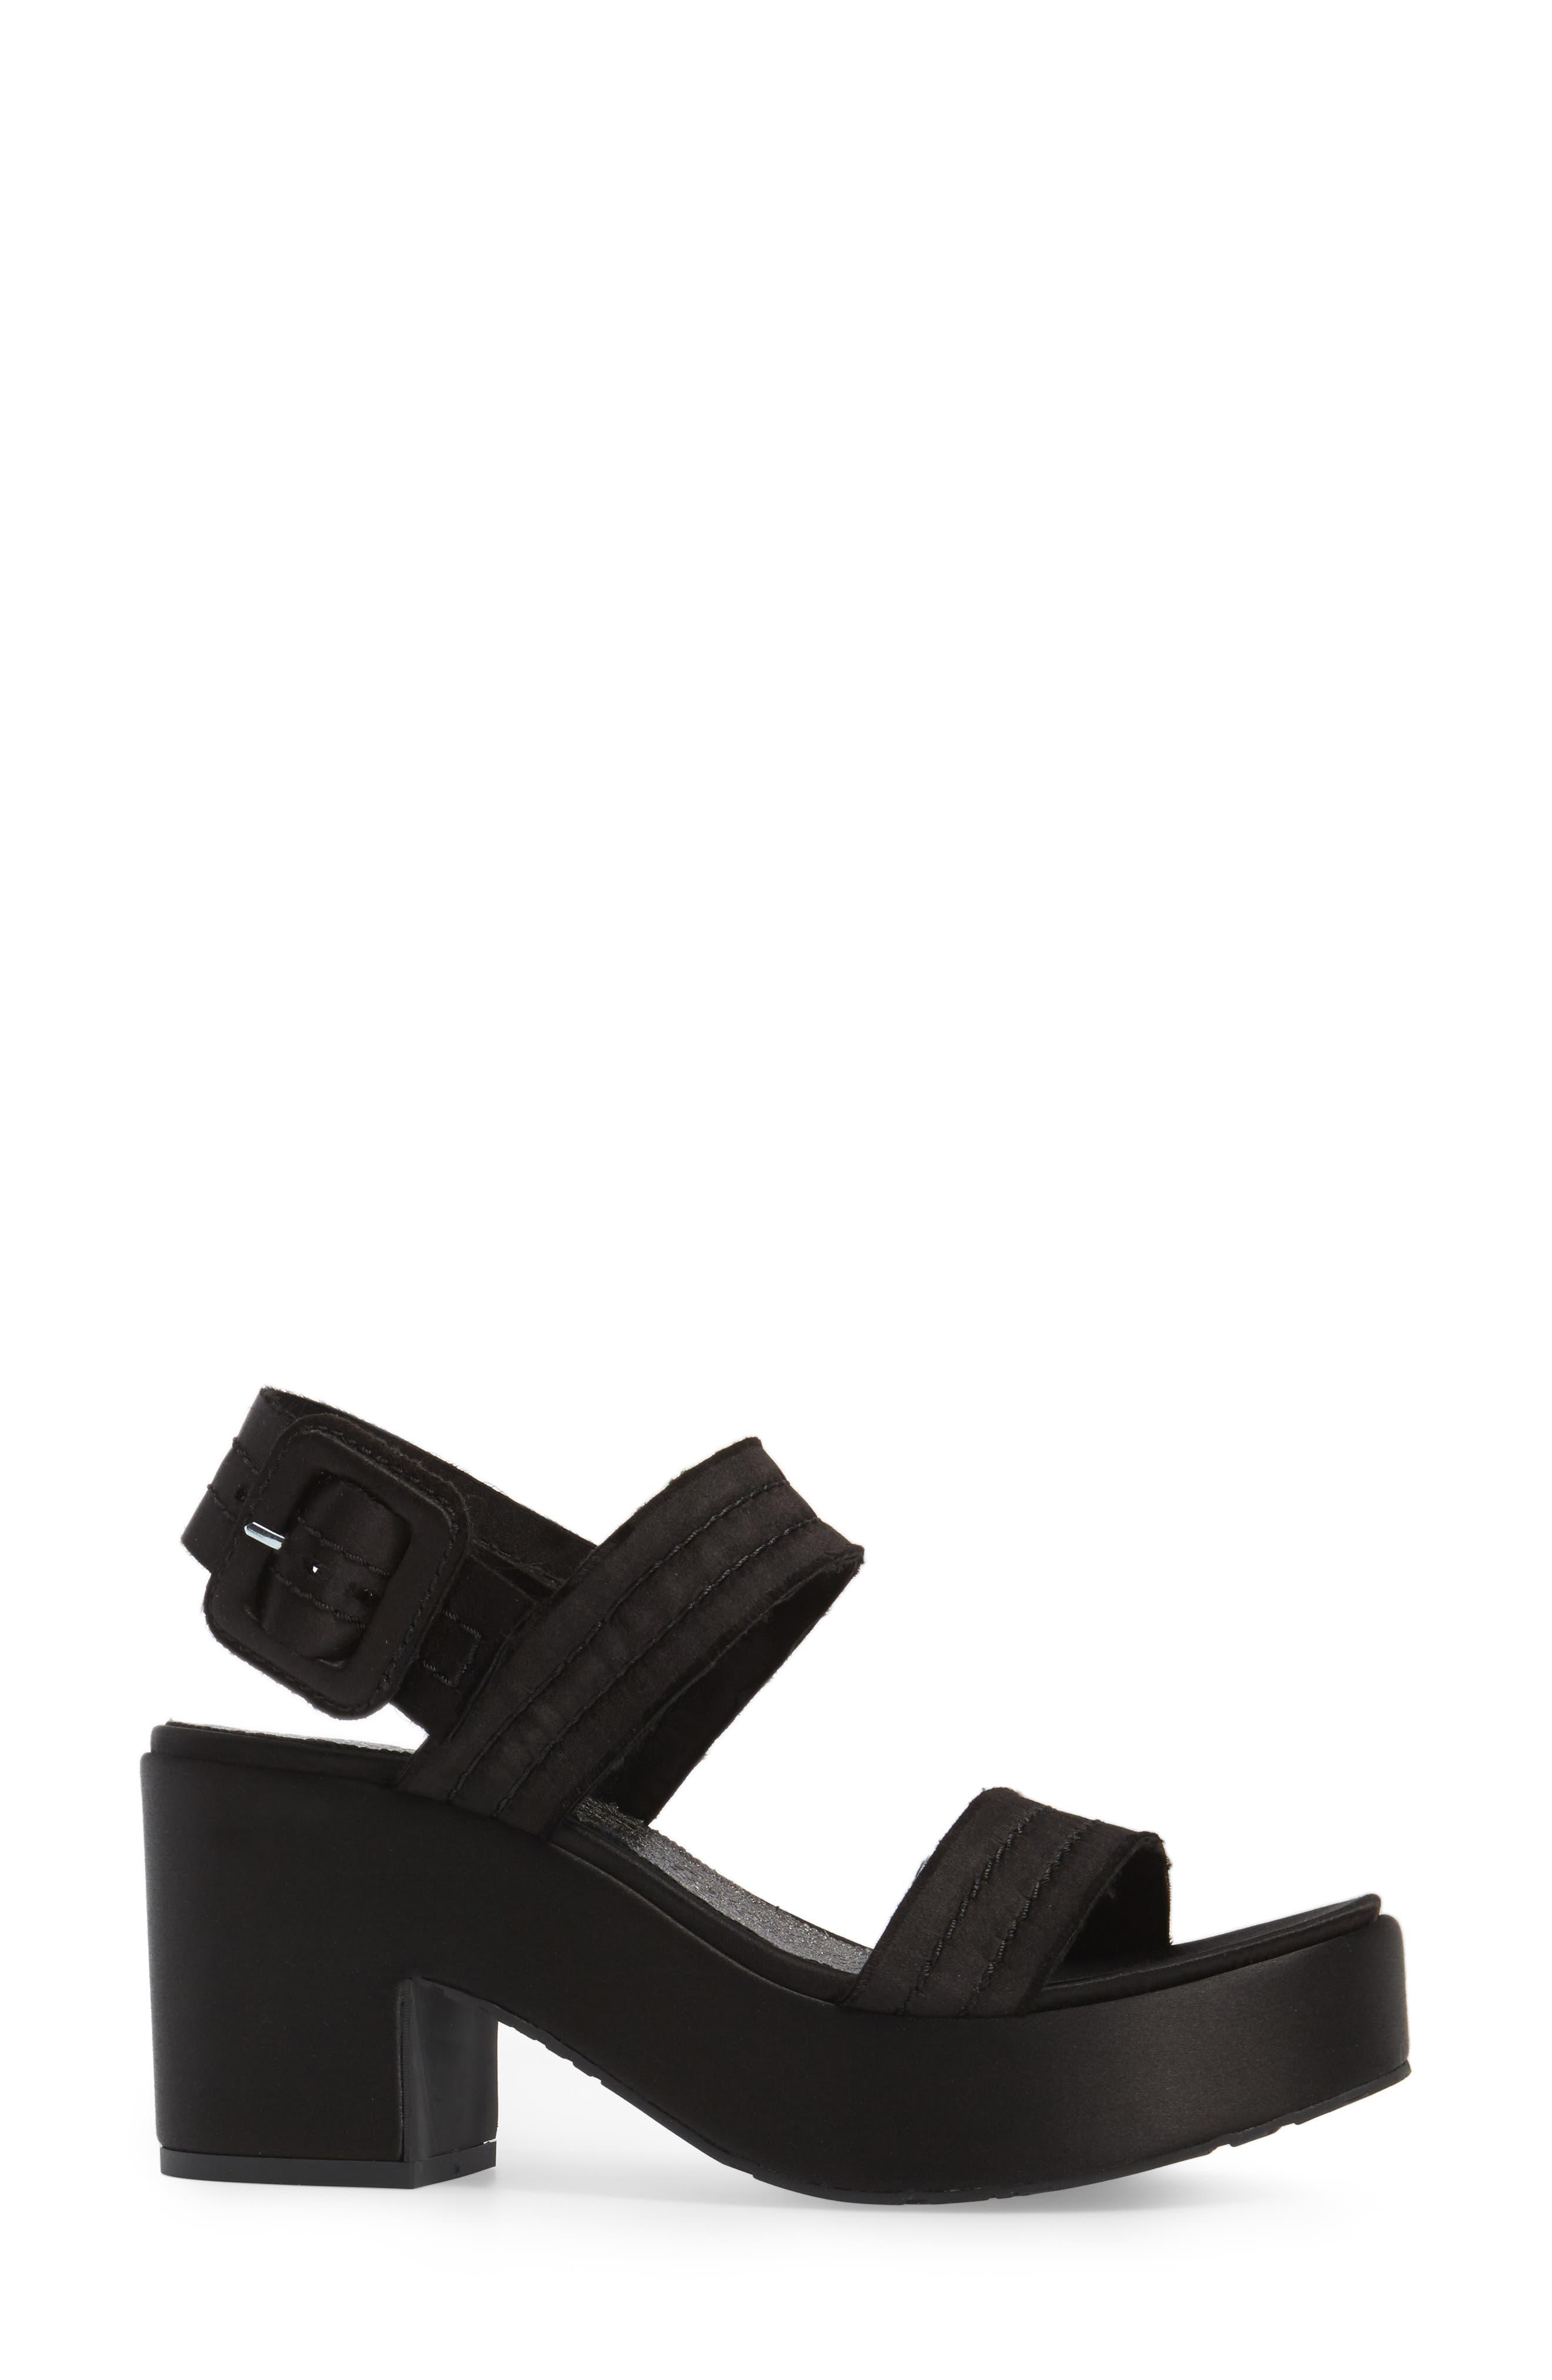 Decima Platform Sandal,                             Alternate thumbnail 3, color,                             001